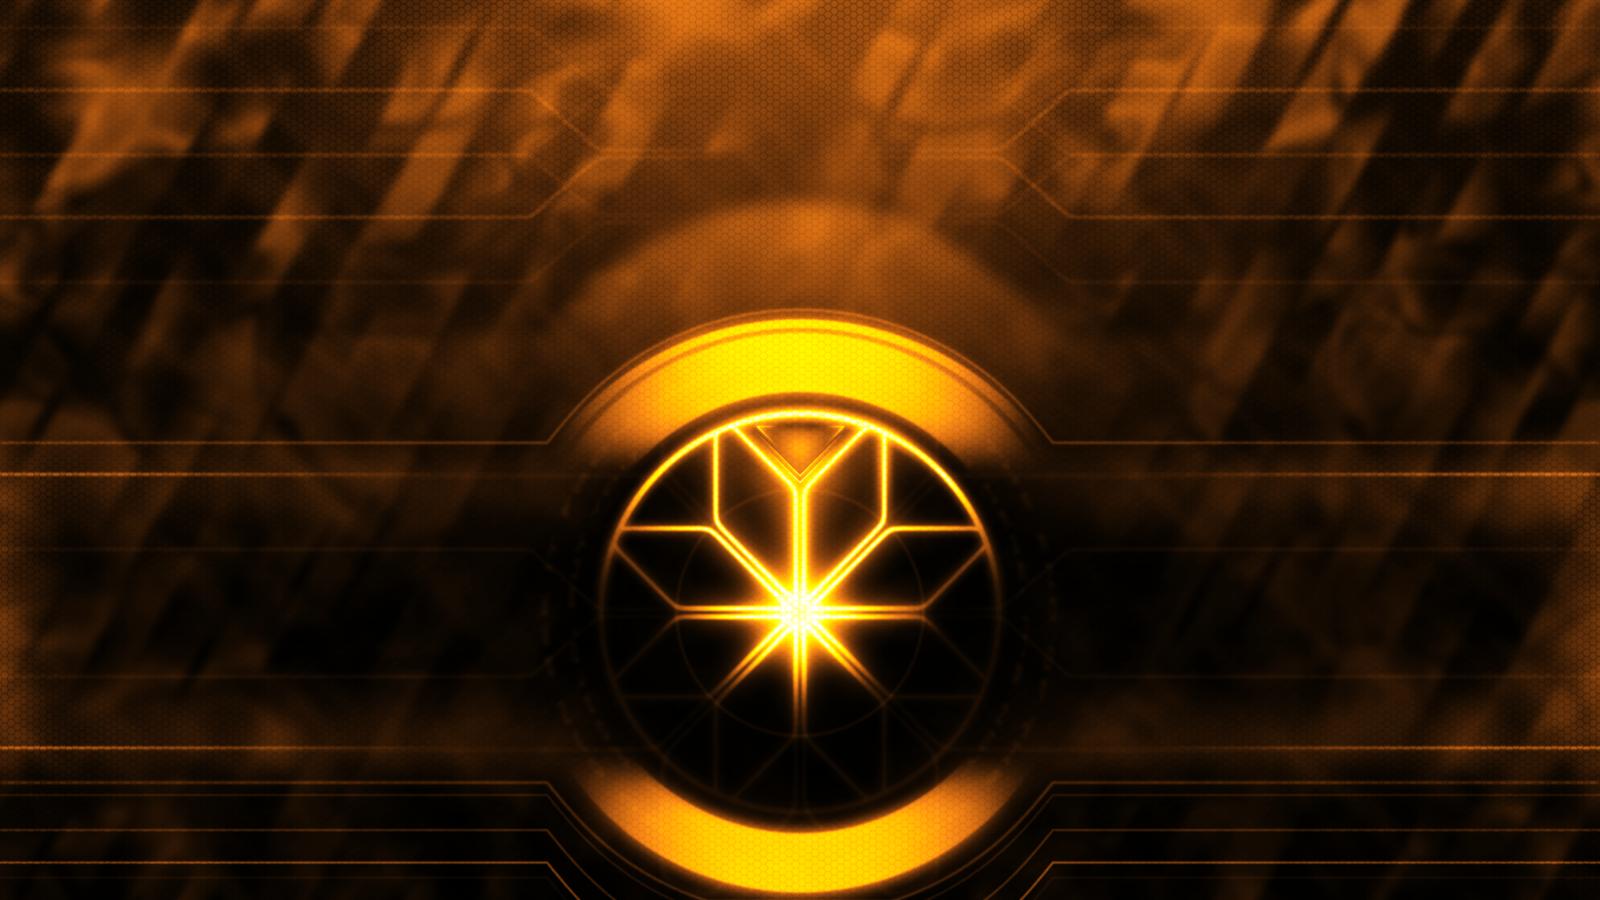 Deus Ex Terminal Wallpaper by Sooner266 1600x900